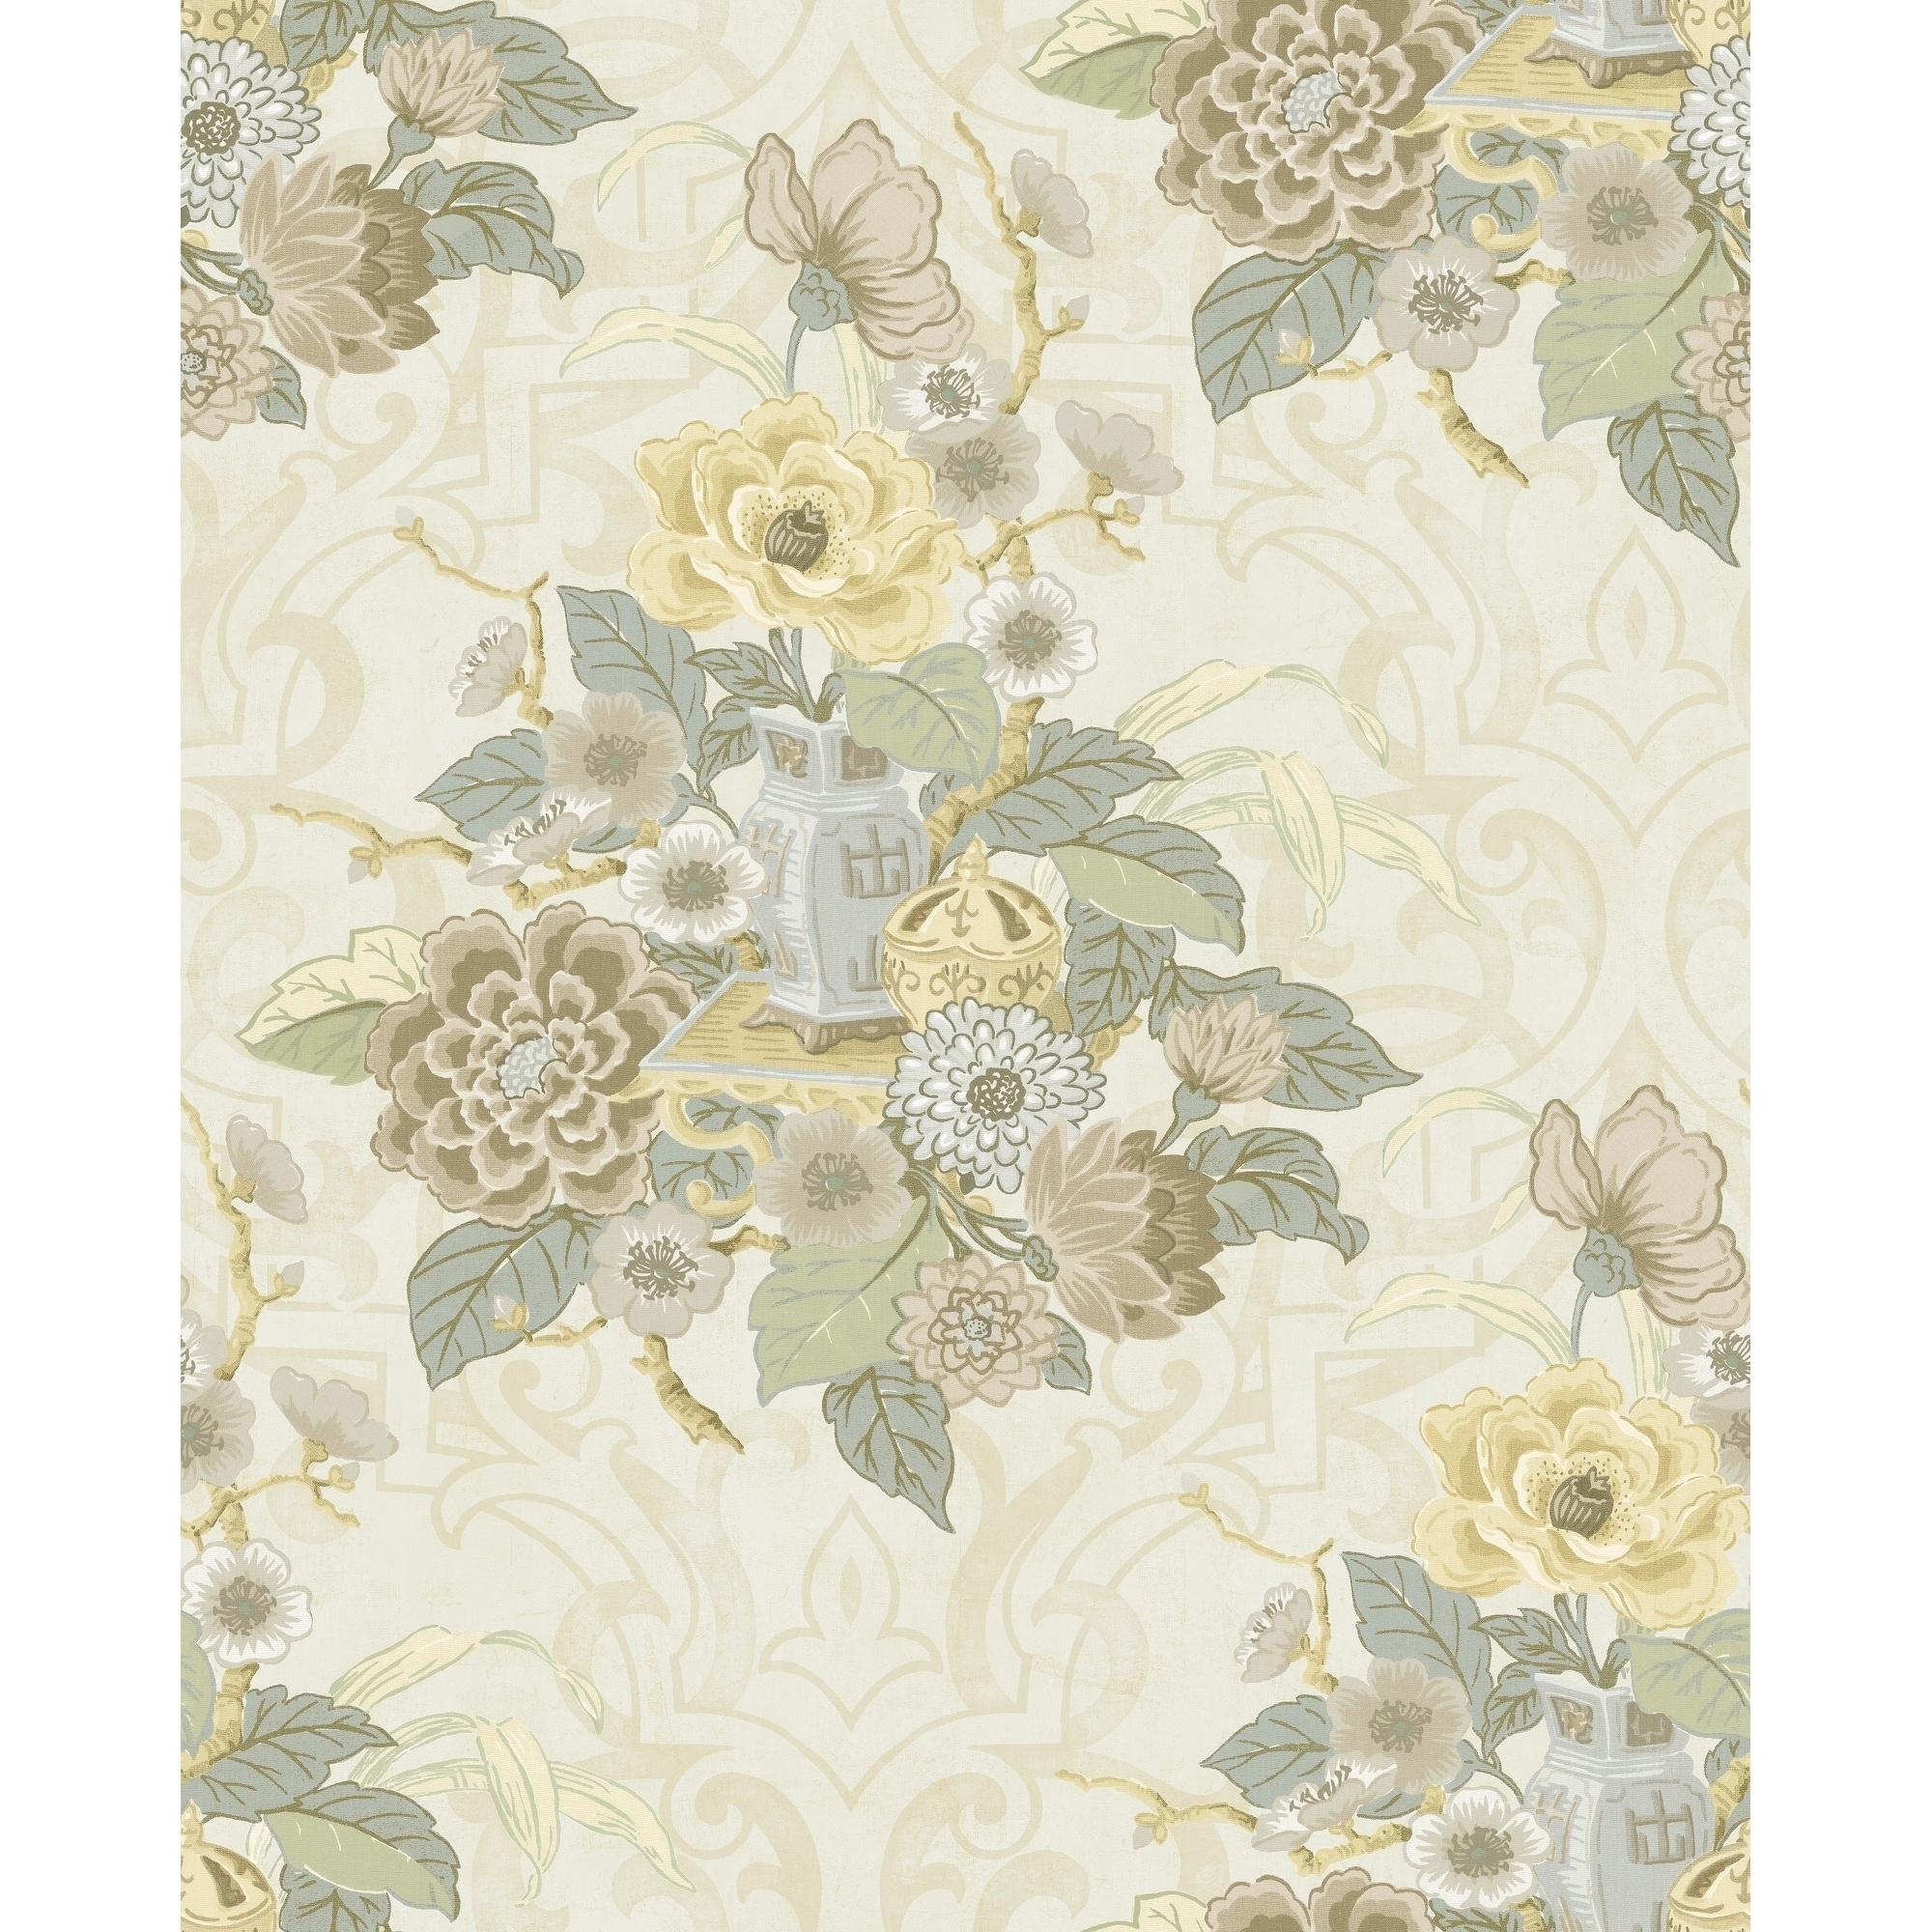 Shop Metallic Dynasty Floral Wallpaper 32 81 Feet Long X 20 5